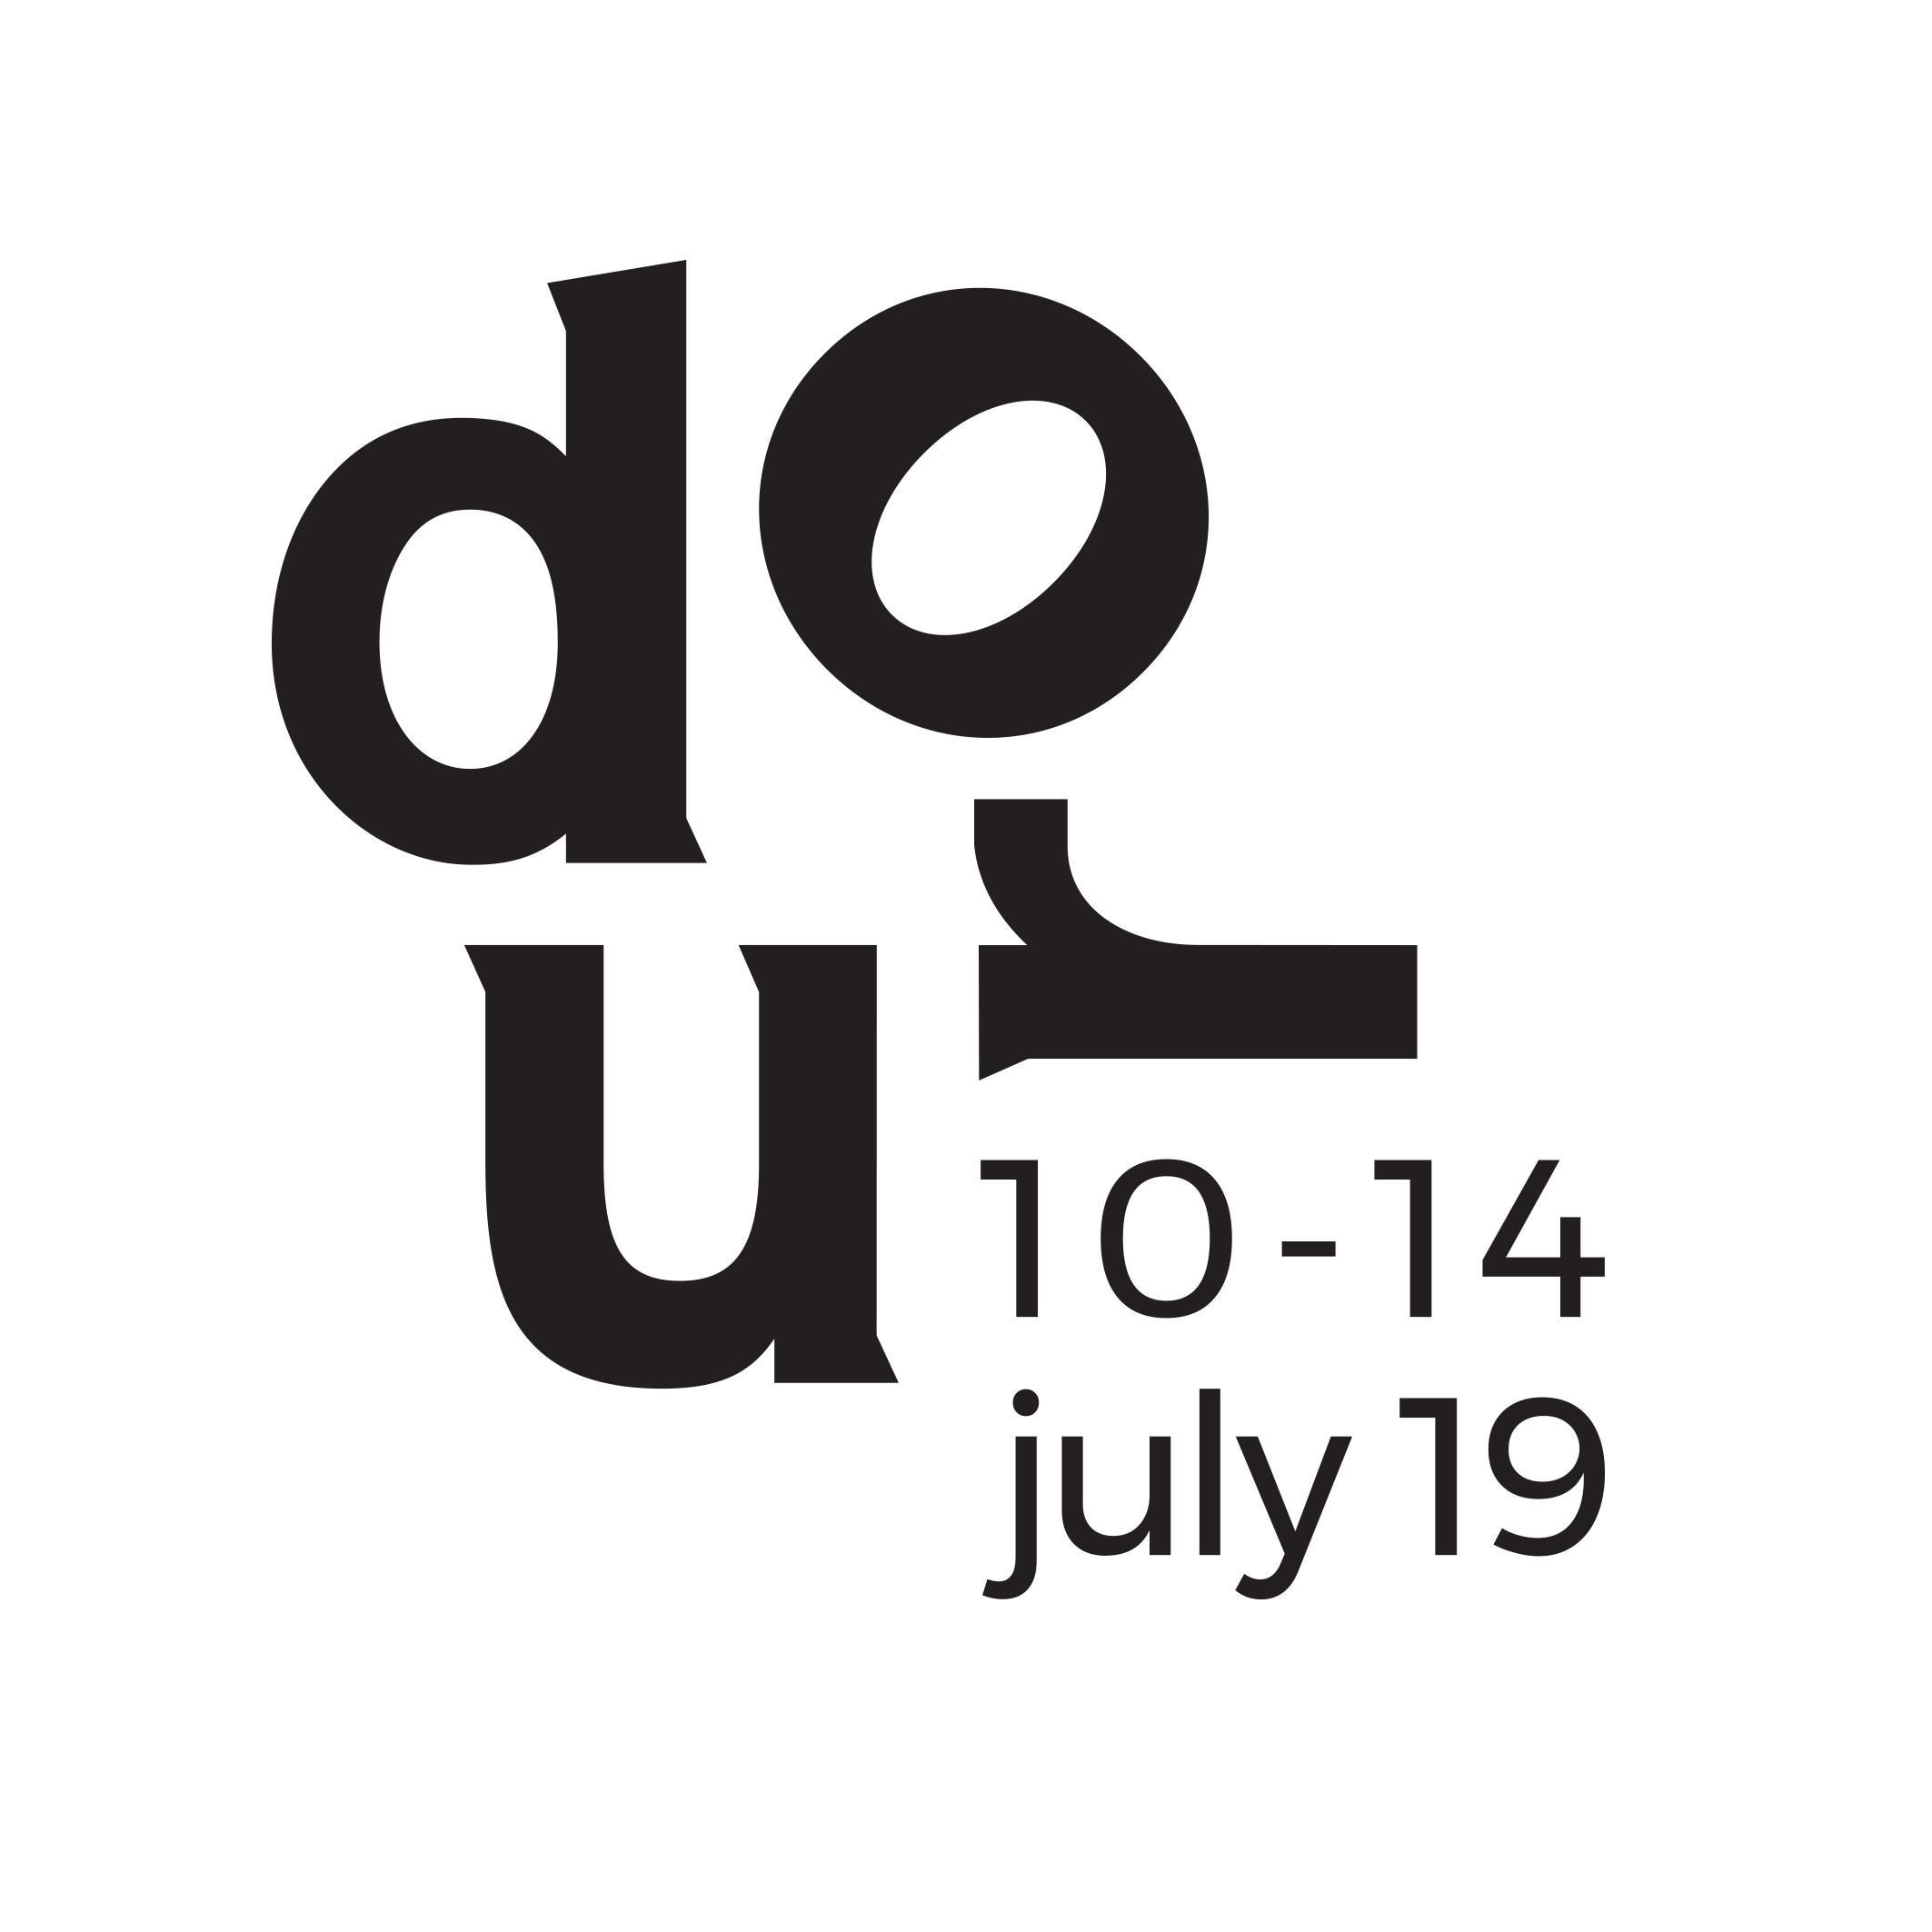 Dour Festival 2019